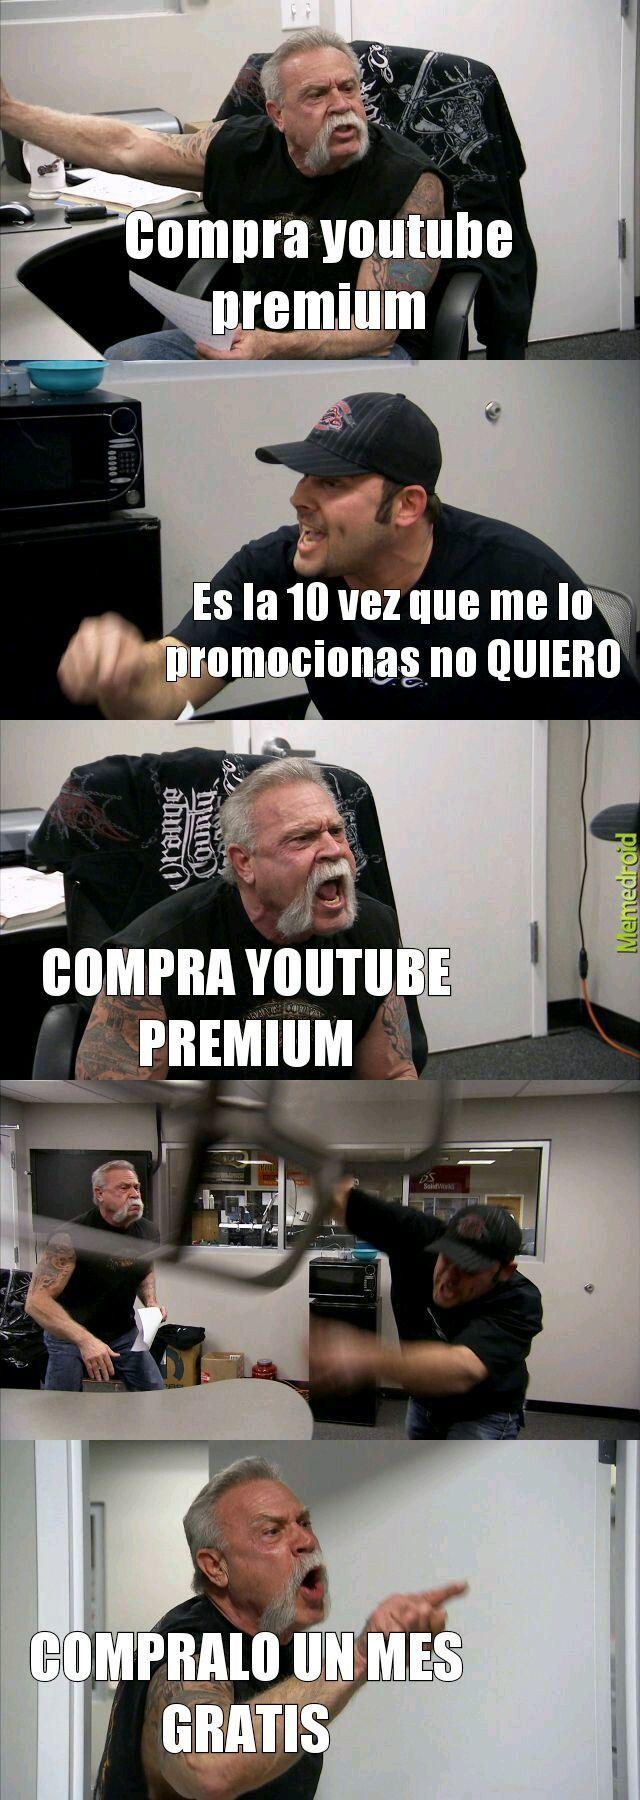 DEJA DE JODER - meme